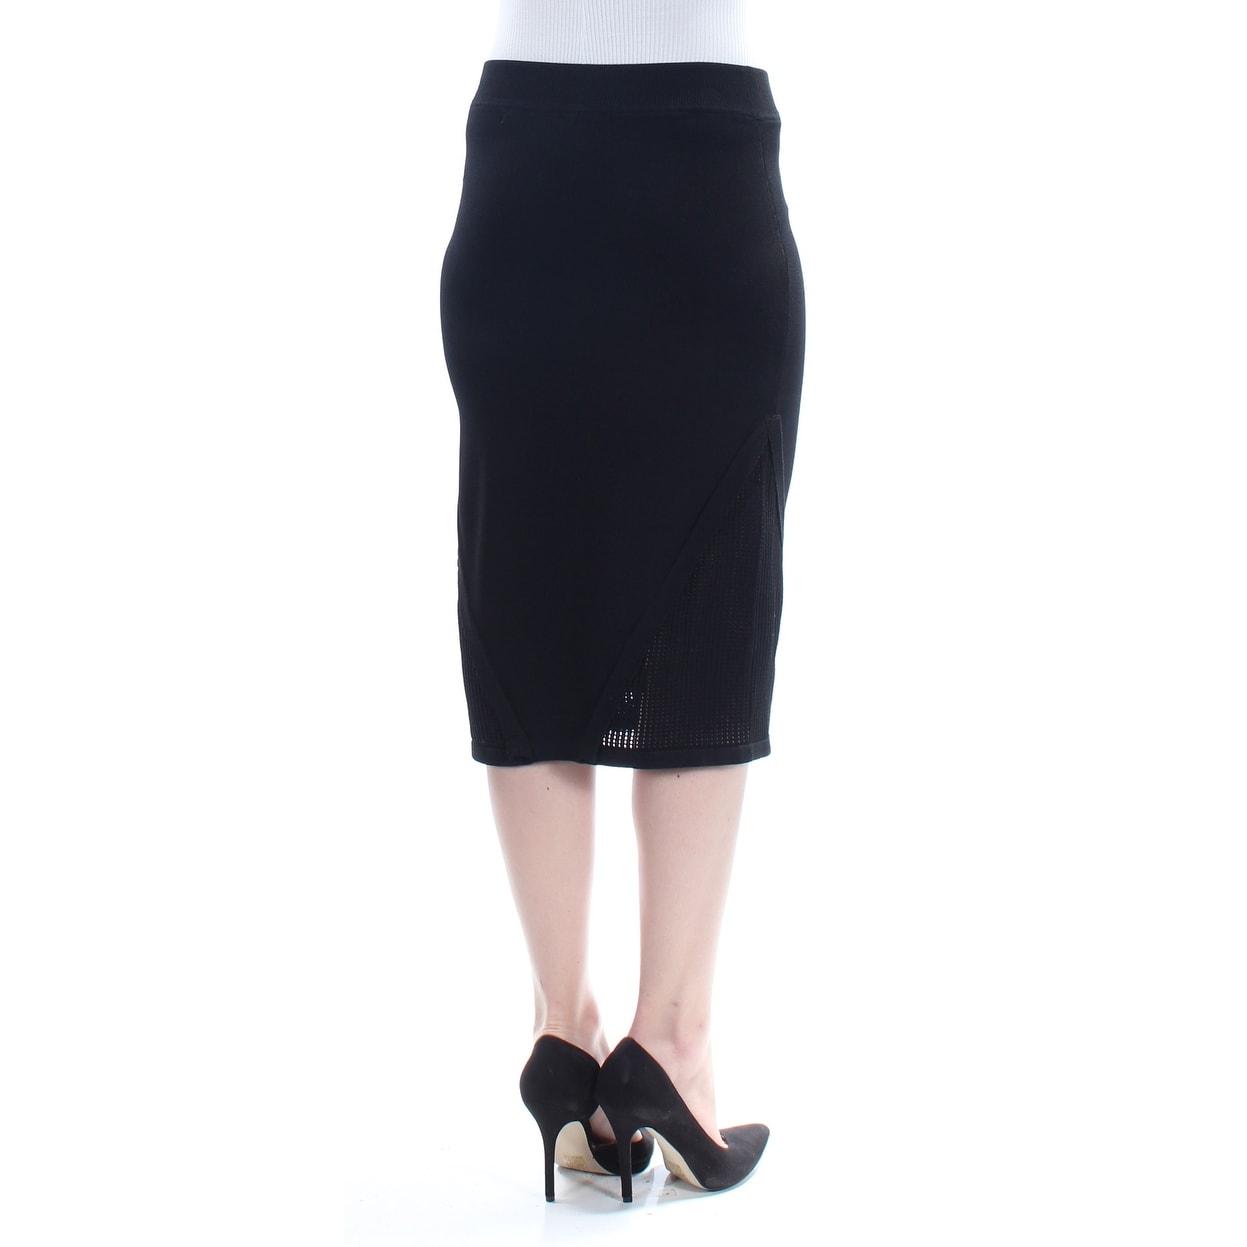 0fdf3e883b Shop RACHEL ROY Womens Black Mesh Knee Length Pencil Skirt Size: M - Free  Shipping On Orders Over $45 - Overstock - 23466411